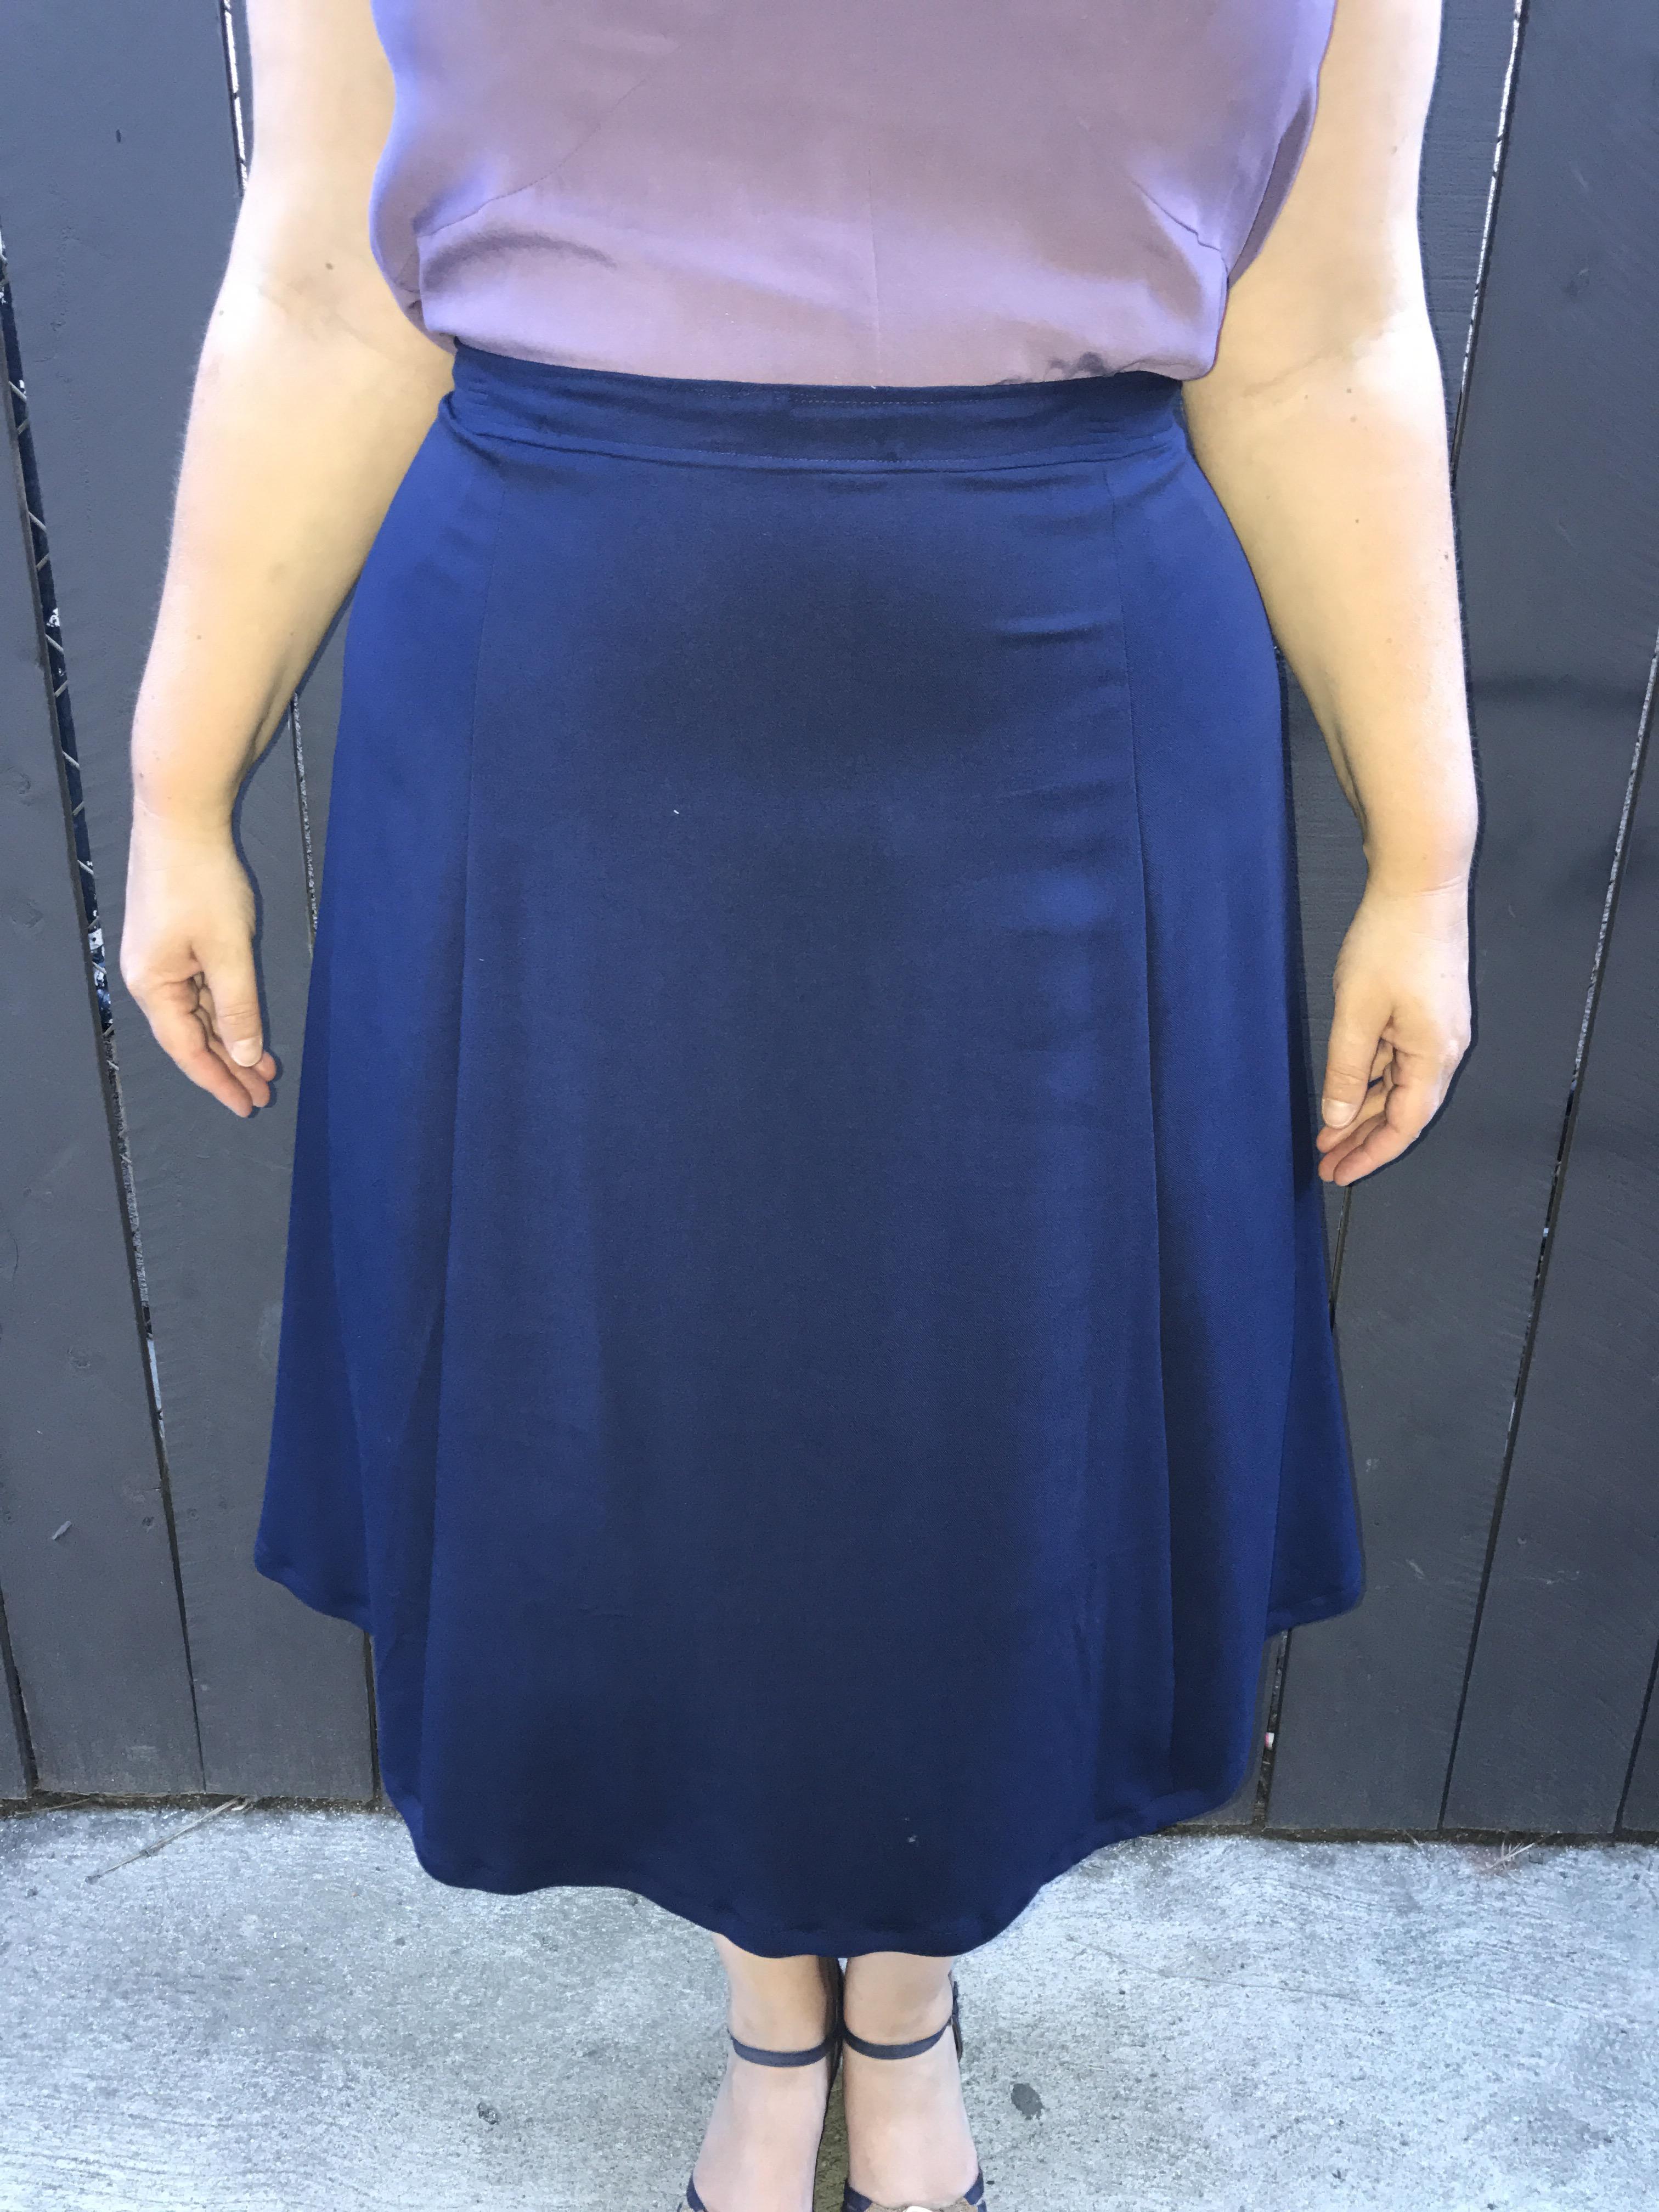 Reasonably Priced Skirts